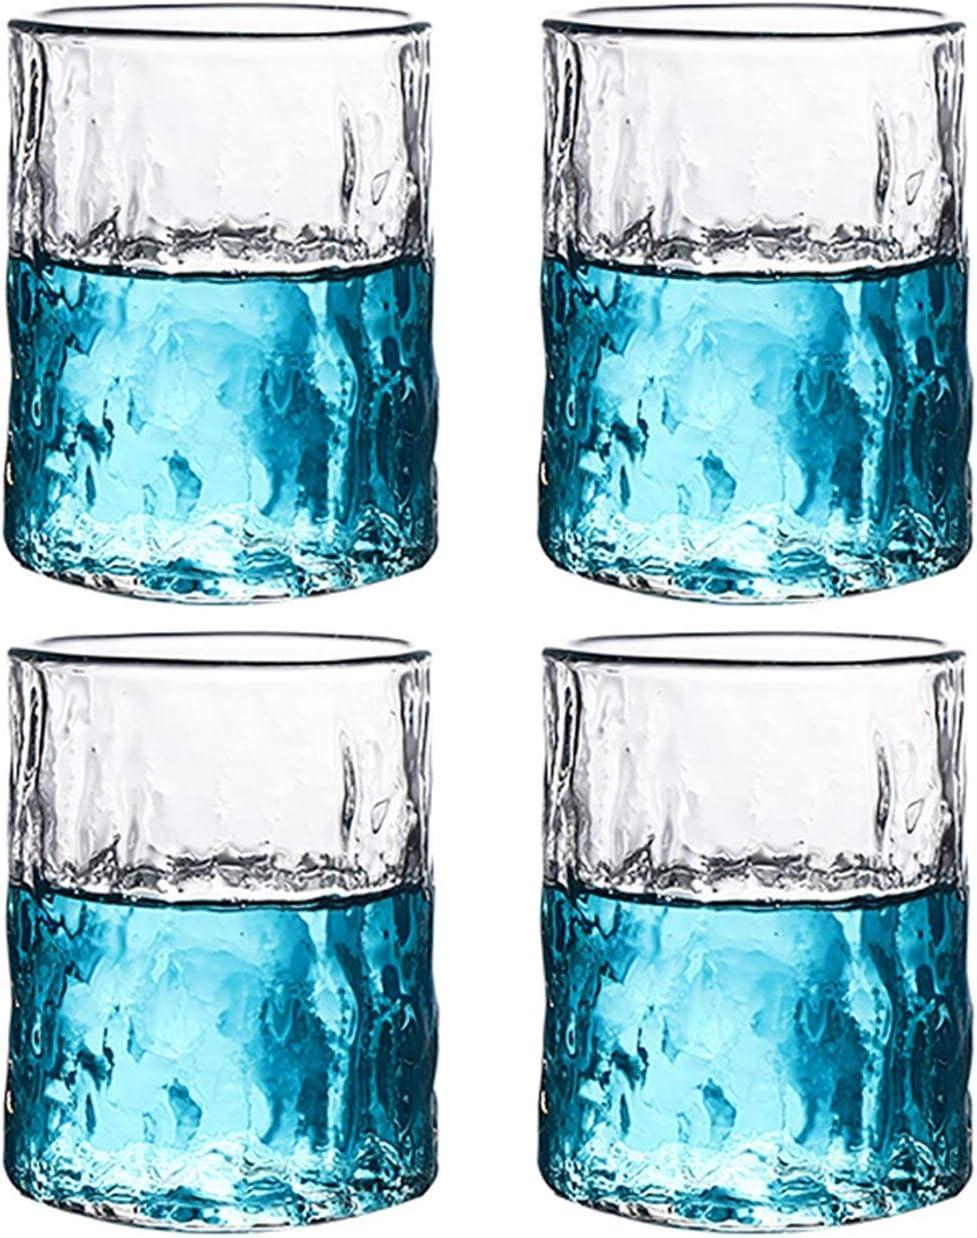 Drinking Glasses Jacksonville Mall Sale price 4PCS Glass Set Glas Tumblers Glassware